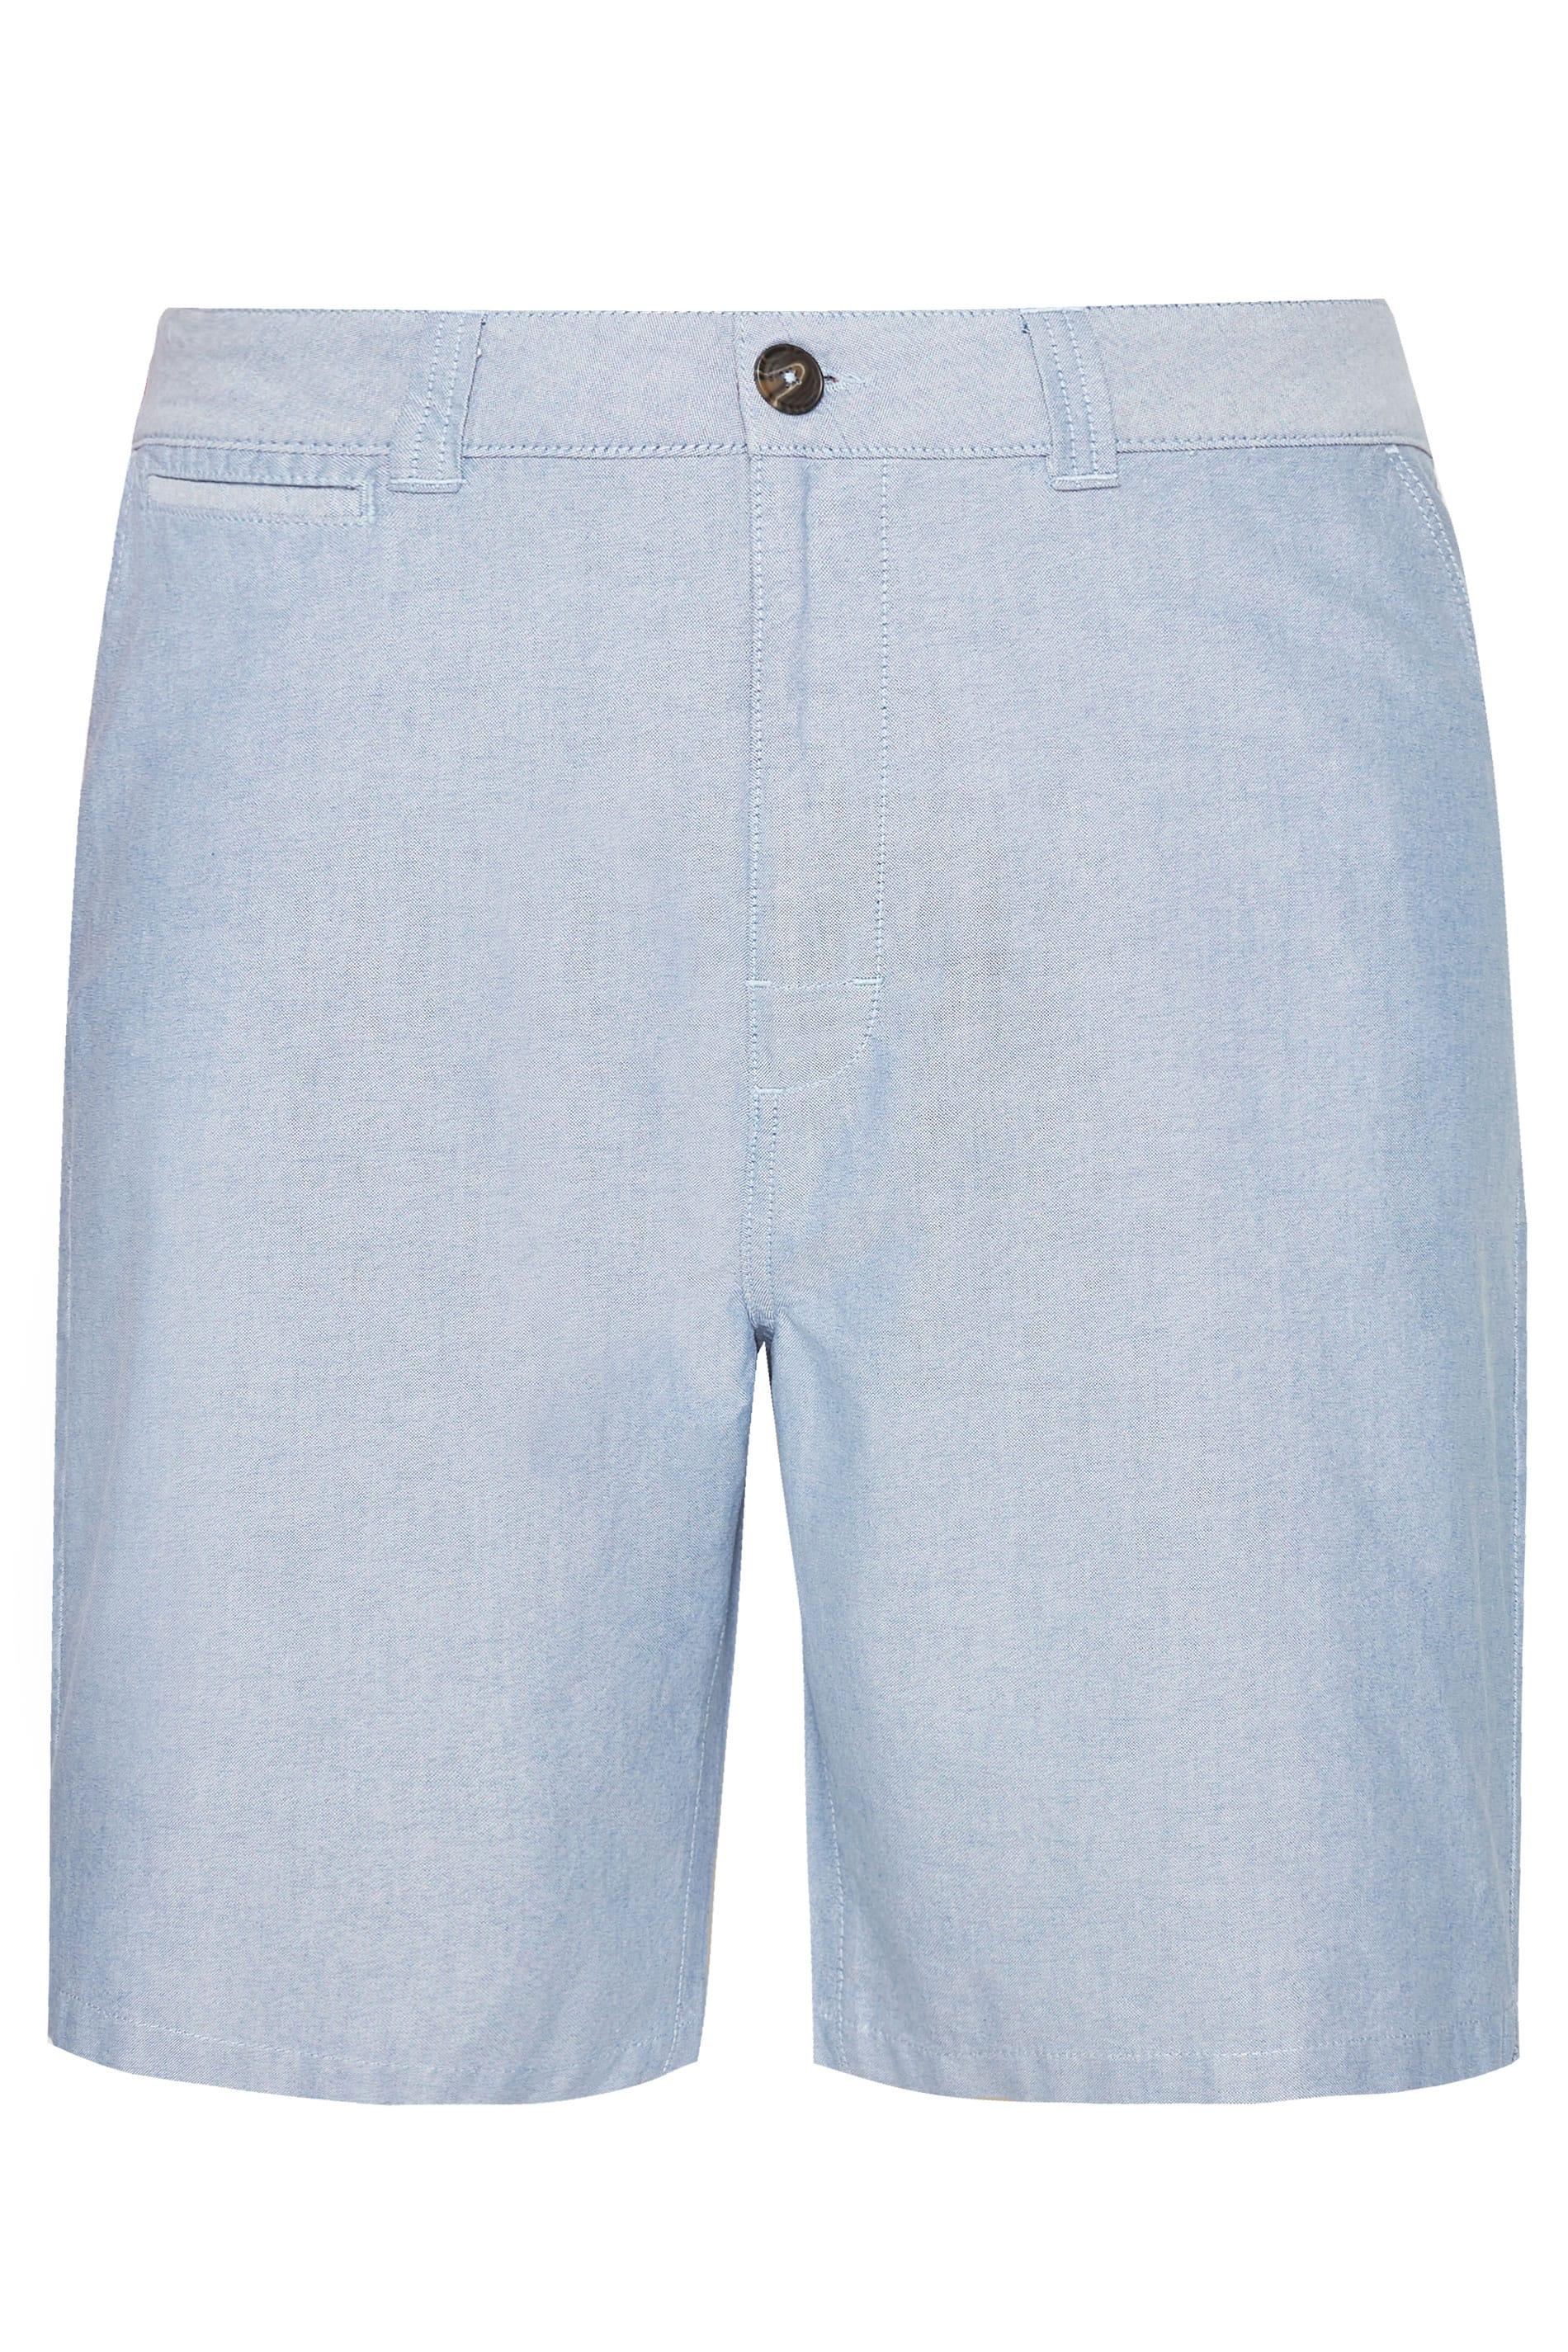 BadRhino Blue Chambray Shorts